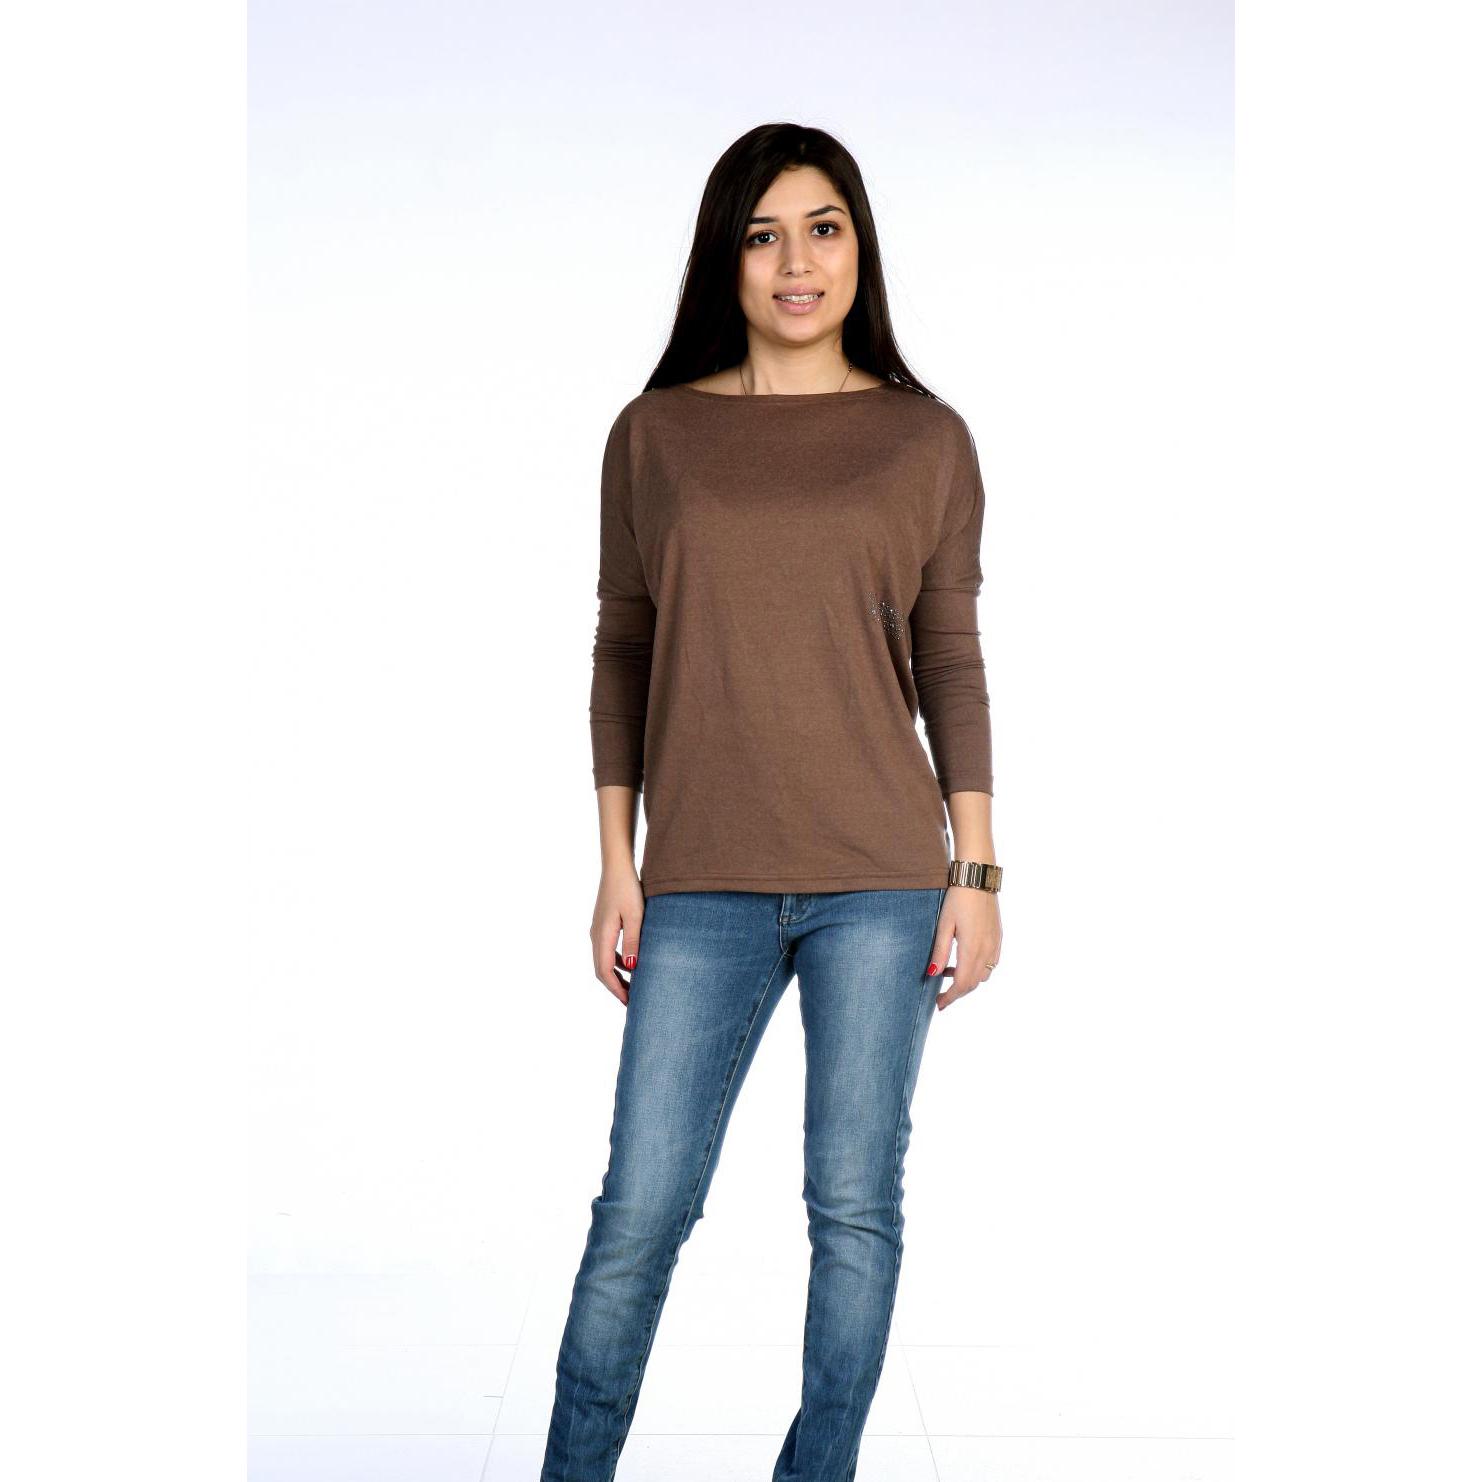 Женская блуза Этюд Коричневый, размер 44Блузки, майки, кофты<br>Обхват груди:88 см<br>Обхват талии:68 см<br>Обхват бедер:96 см<br>Рост:167 см<br><br>Тип: Жен. блуза<br>Размер: 44<br>Материал: Хамур